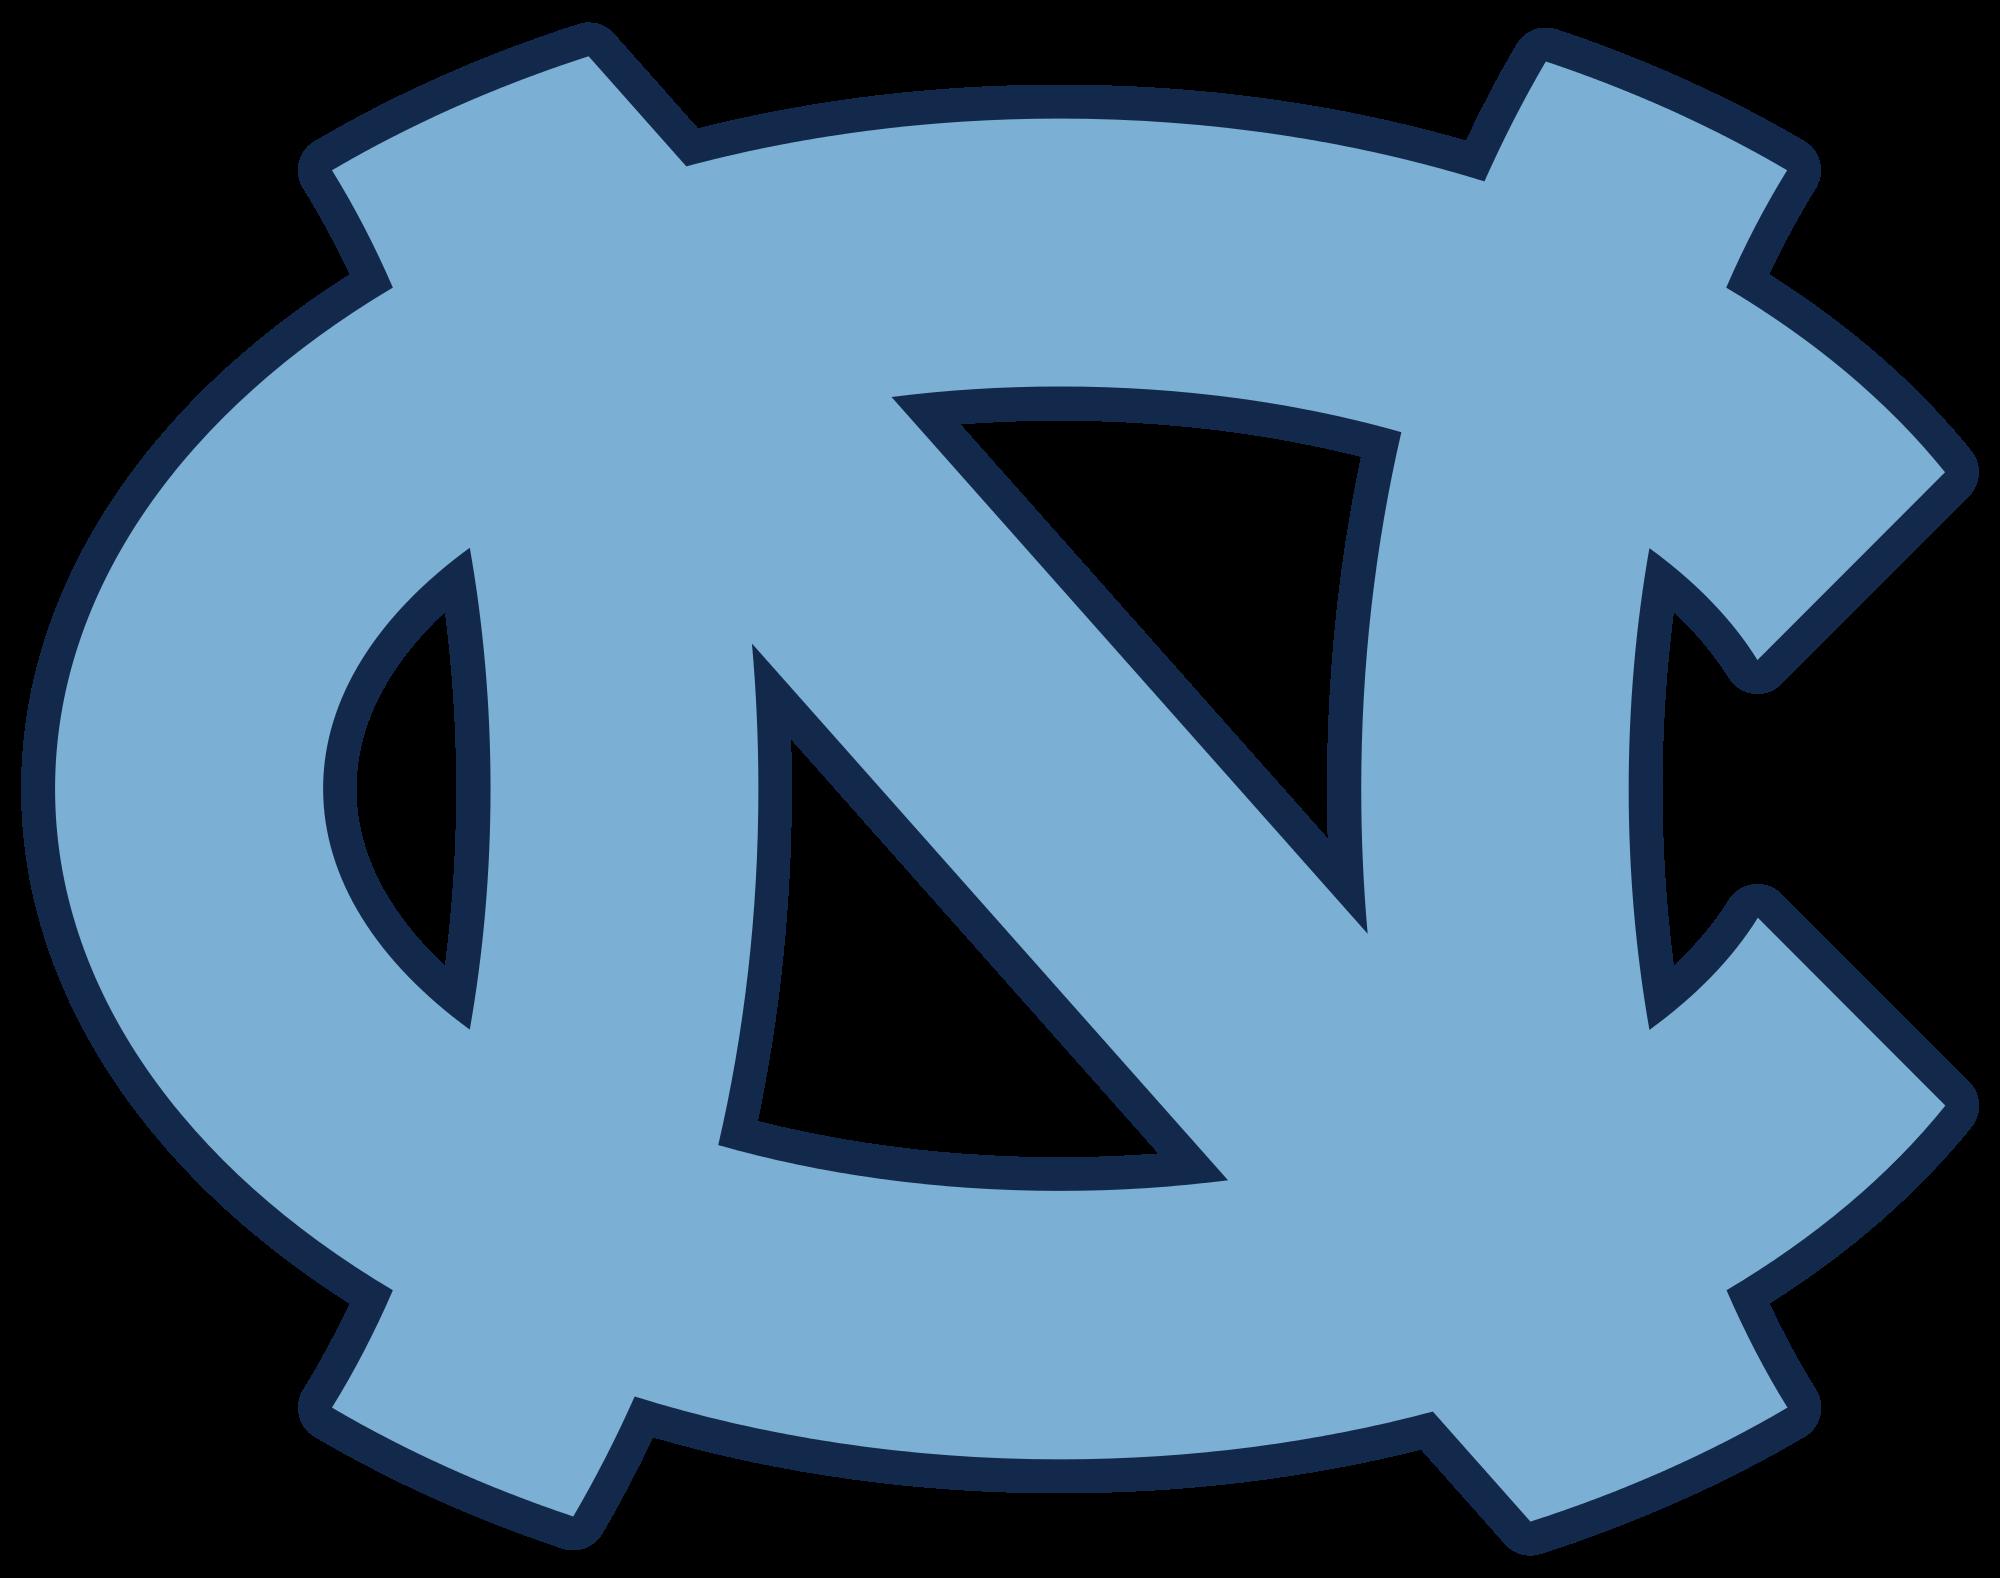 Basketball homecoming clipart vector transparent download File:University of North Carolina Tarheels Interlocking NC logo ... vector transparent download